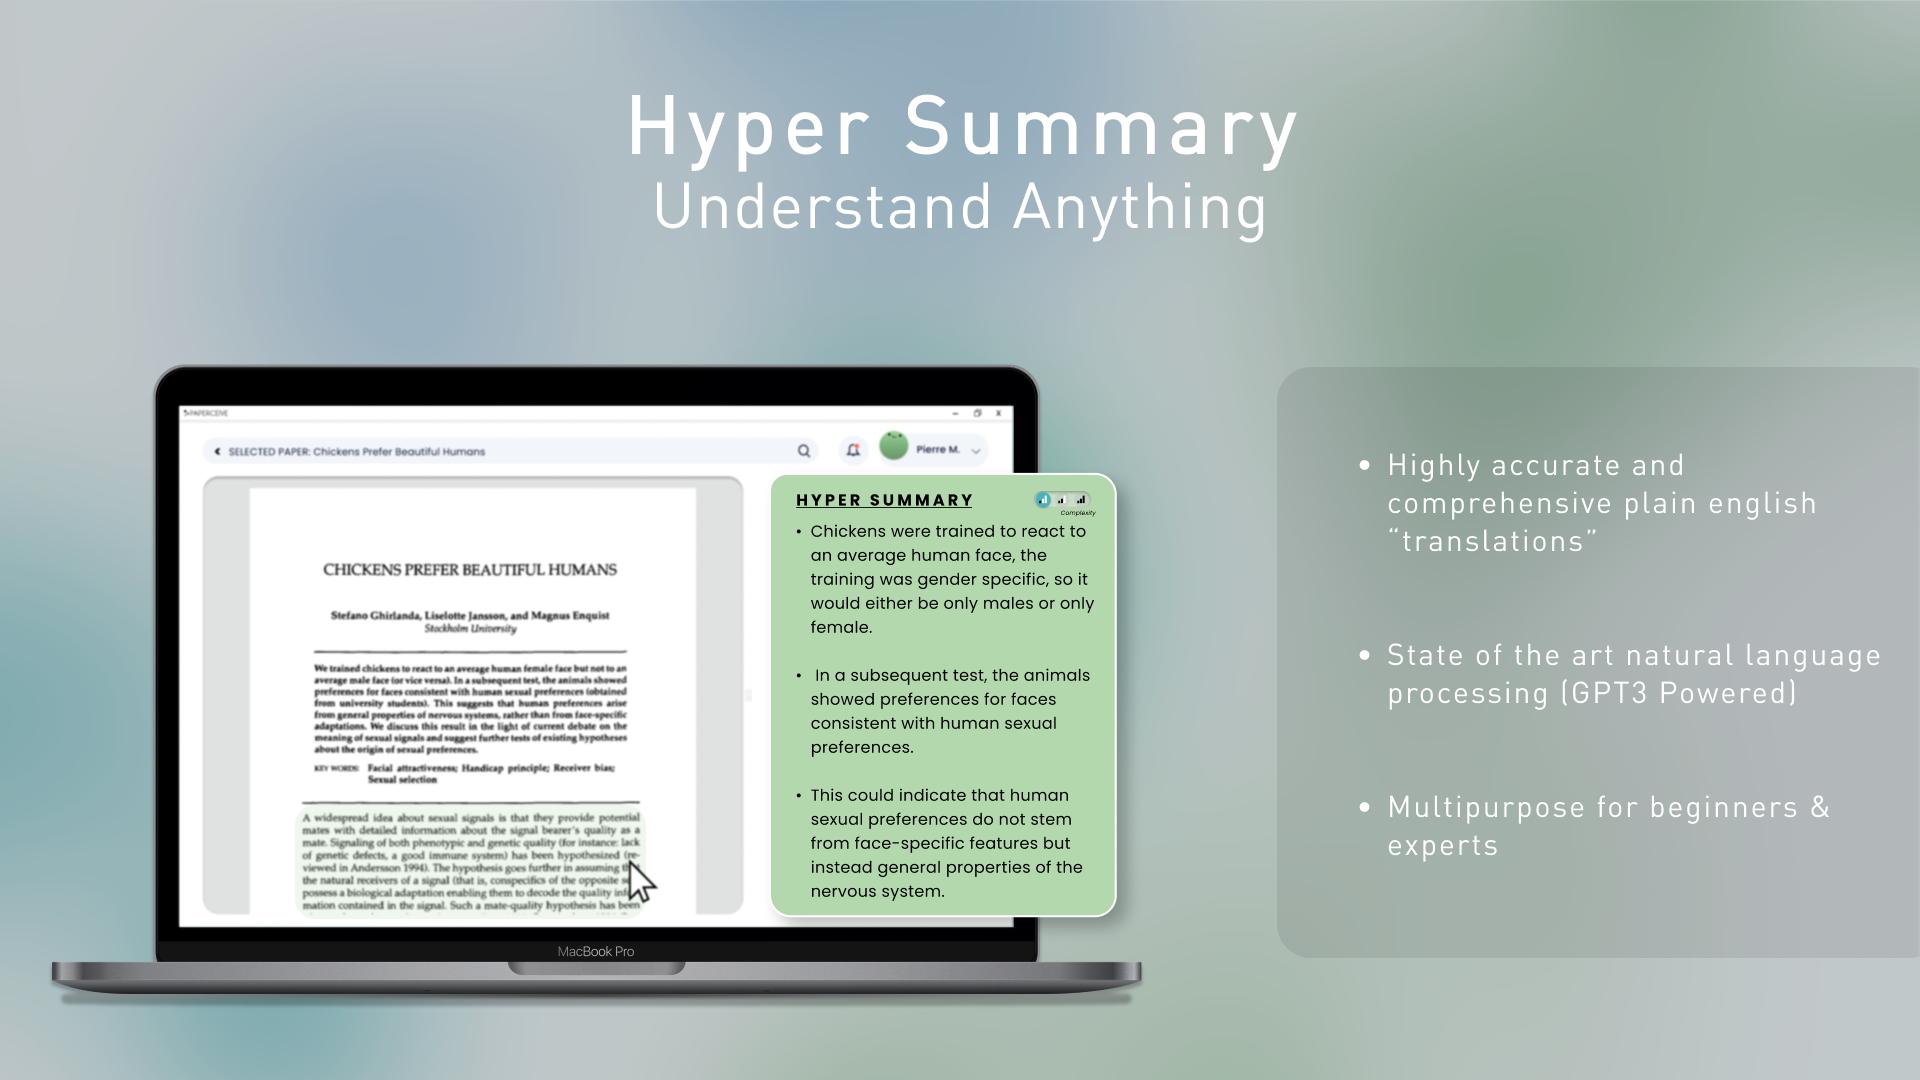 Hyper Summary